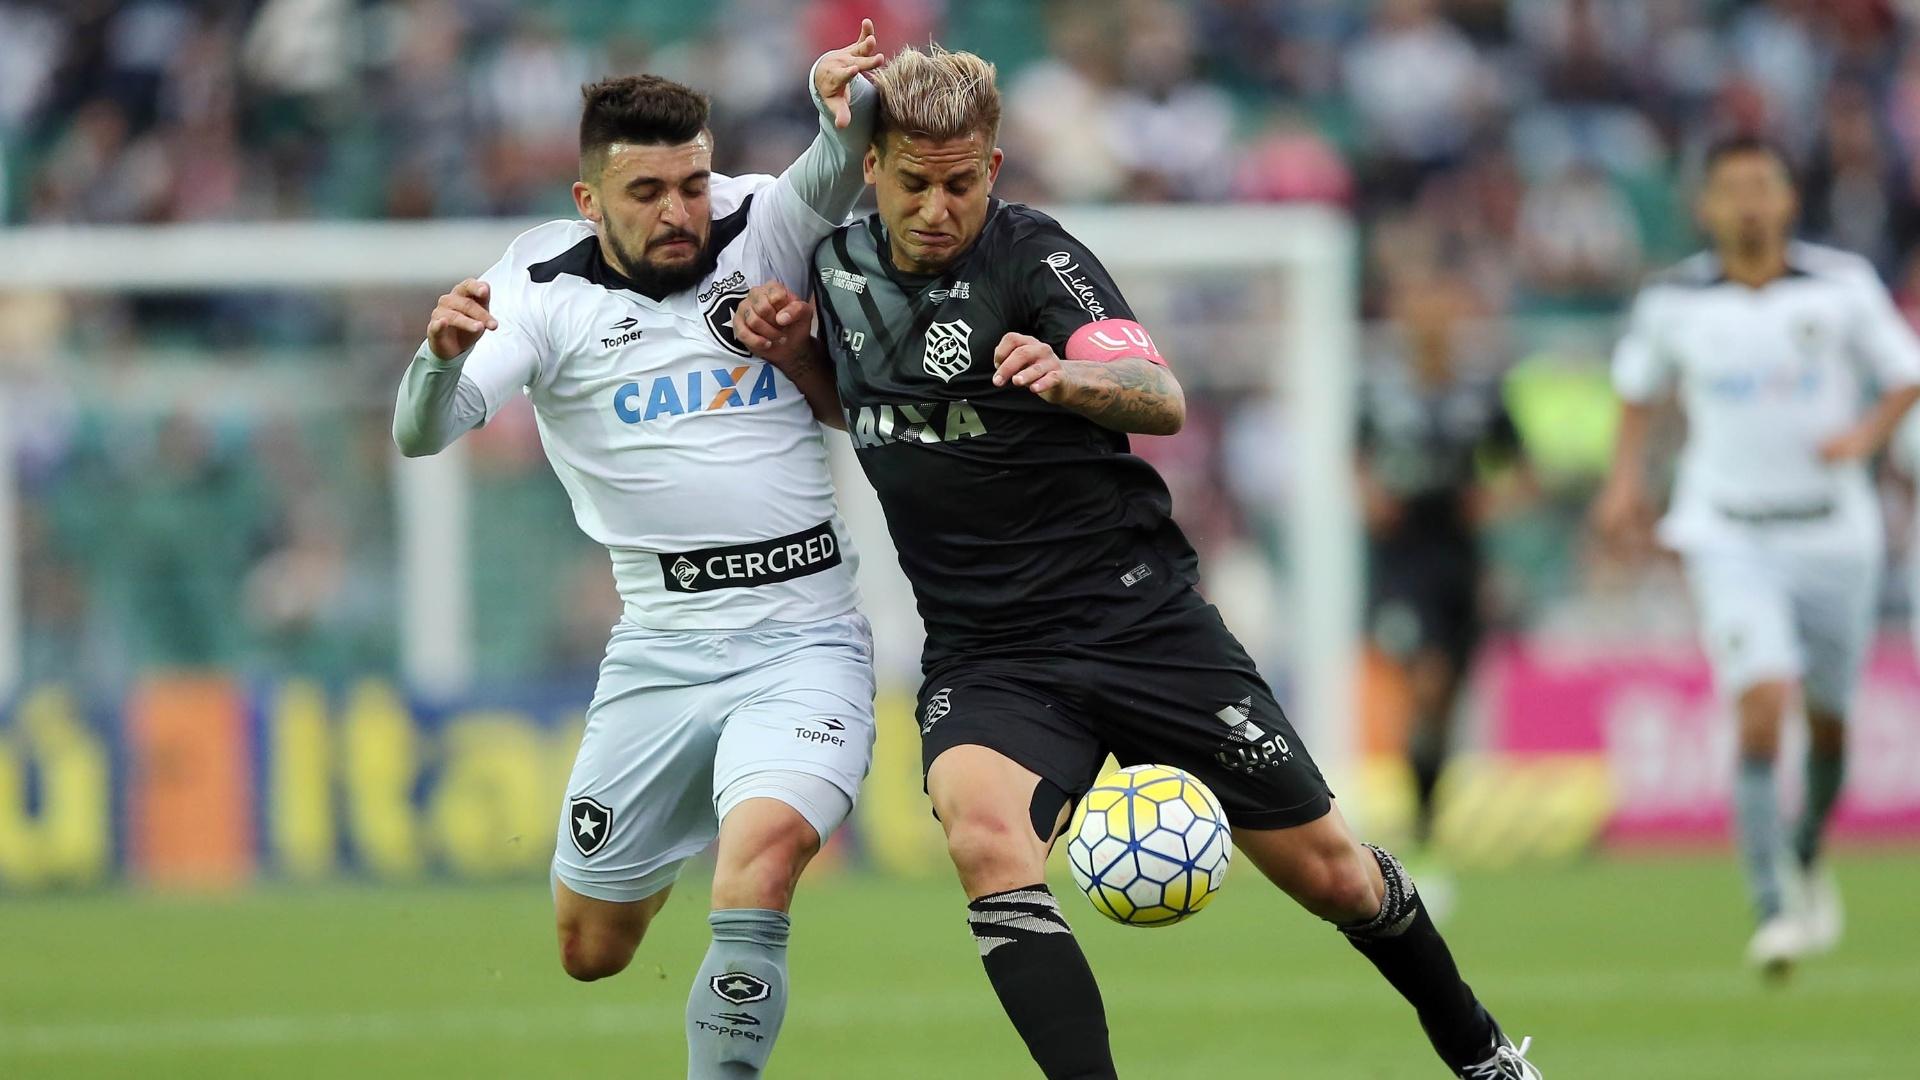 Rafael Moura e Victor Luis disputam bola na partida Figueirense x Botafogo